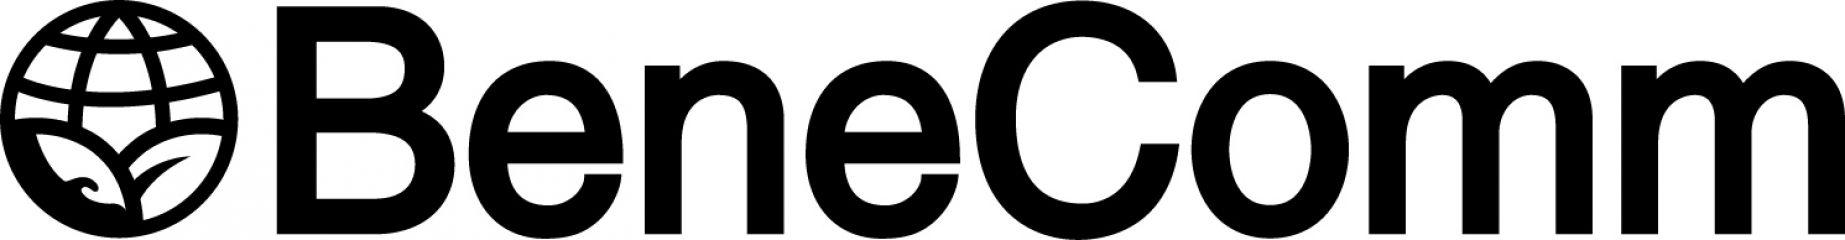 Benecomm Inc AdMass Profile Image